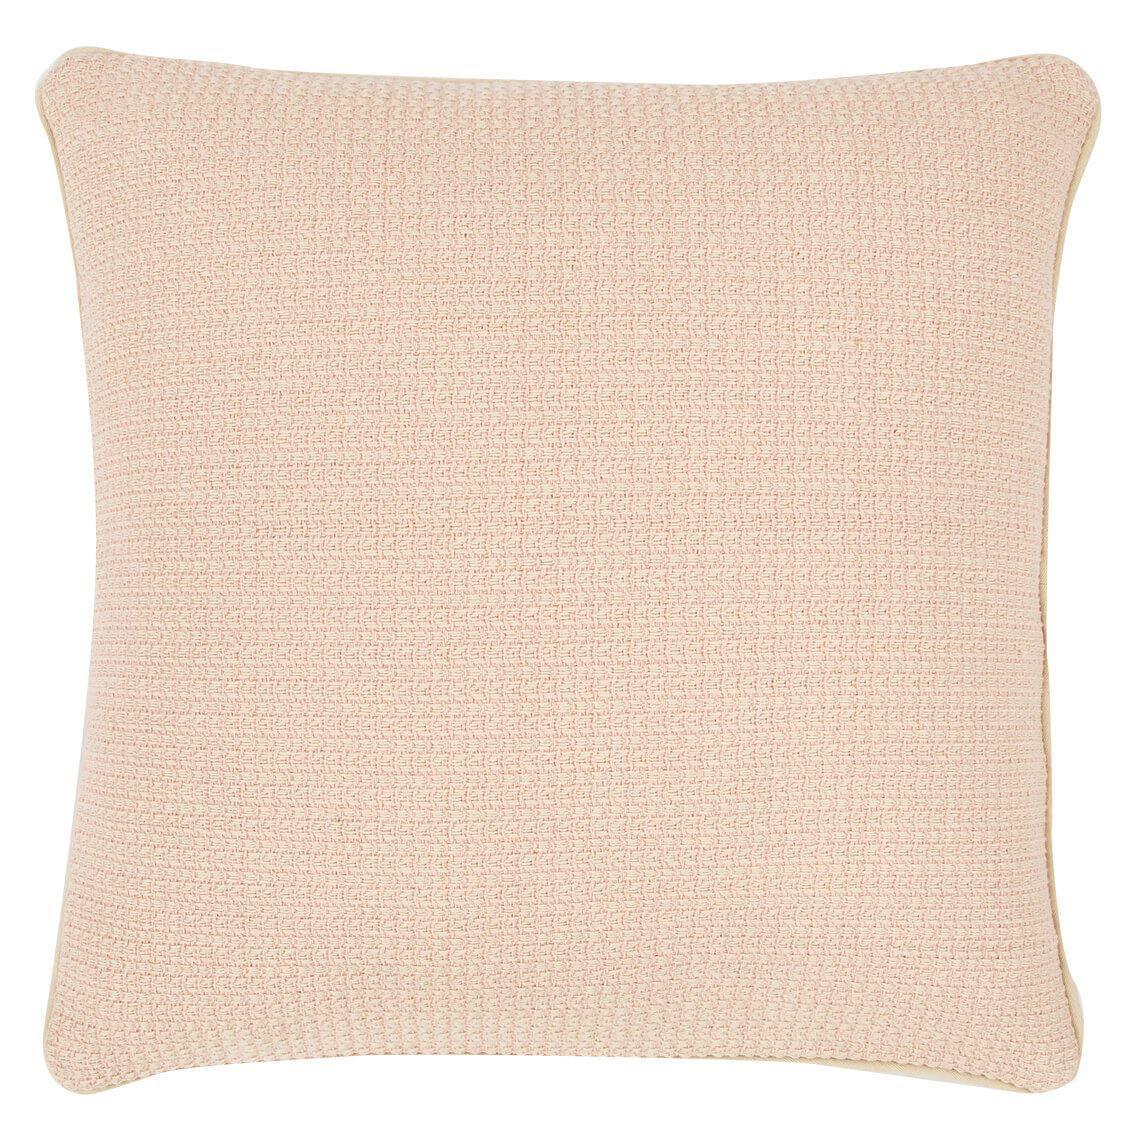 Breah Cushion Size W 50cm x D 50cm x H 8cm in Pink Freedom